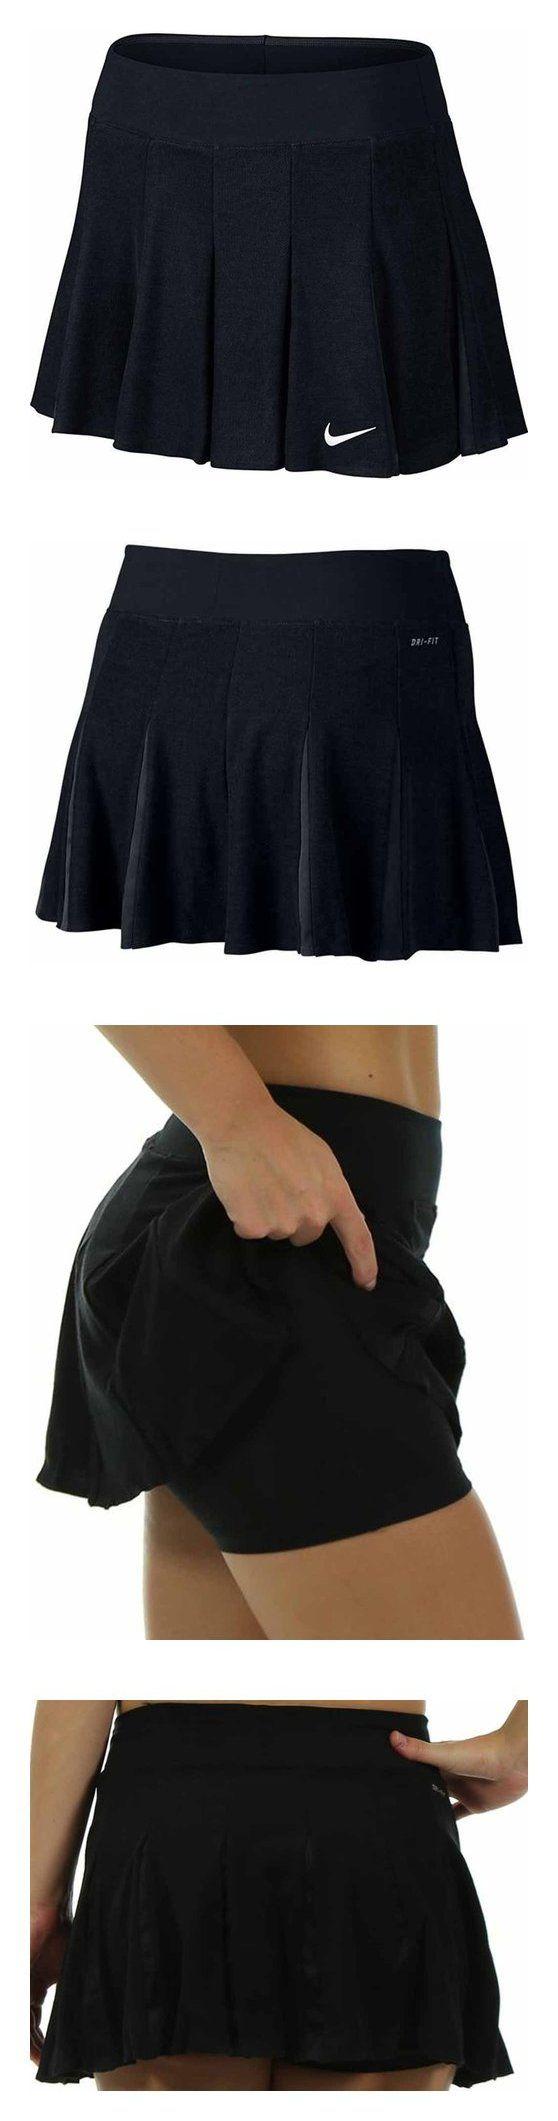 $70 - Nike Premier Maria Sharapova Tennis Skirt long - Black 728833 010 Medium #nike